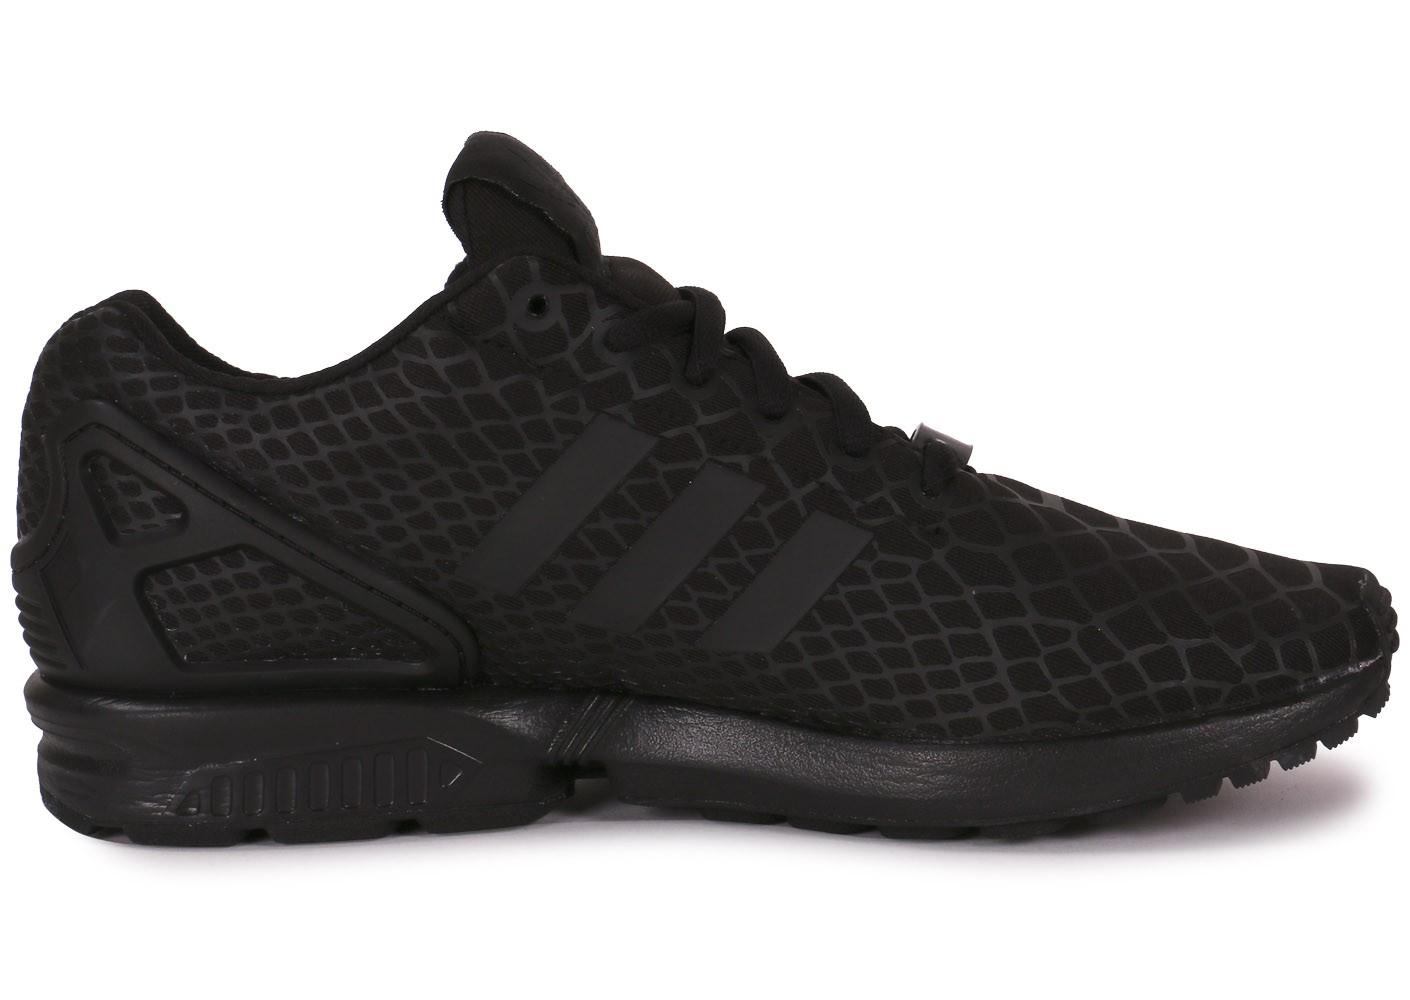 Chaussures homme Baskets Adidas Originals Zx Flux Noir Noir